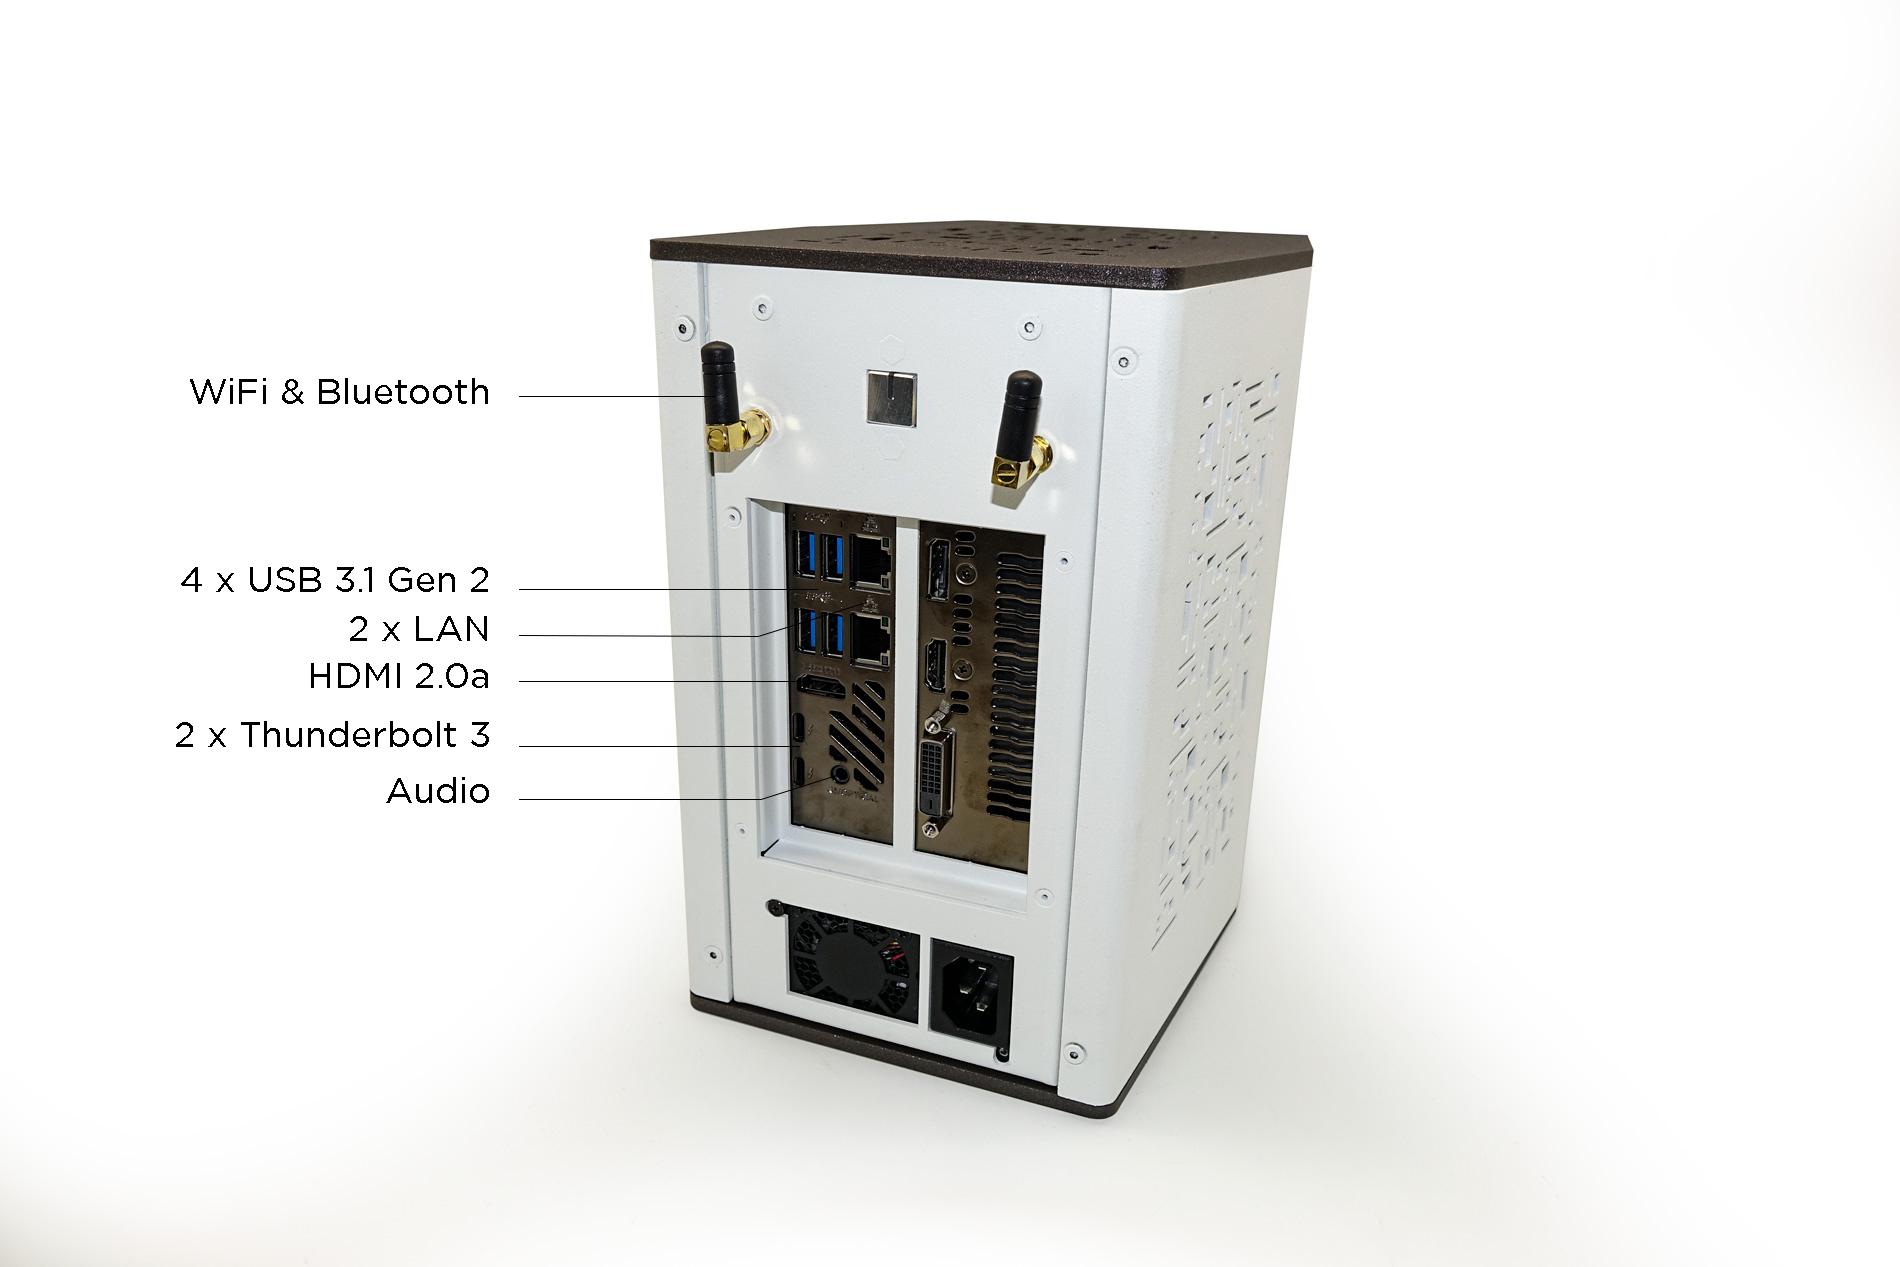 https://www.bleujour.com/wp-content/uploads/2020/08/bleu-jour_move2_72dpi_1_ports.jpg